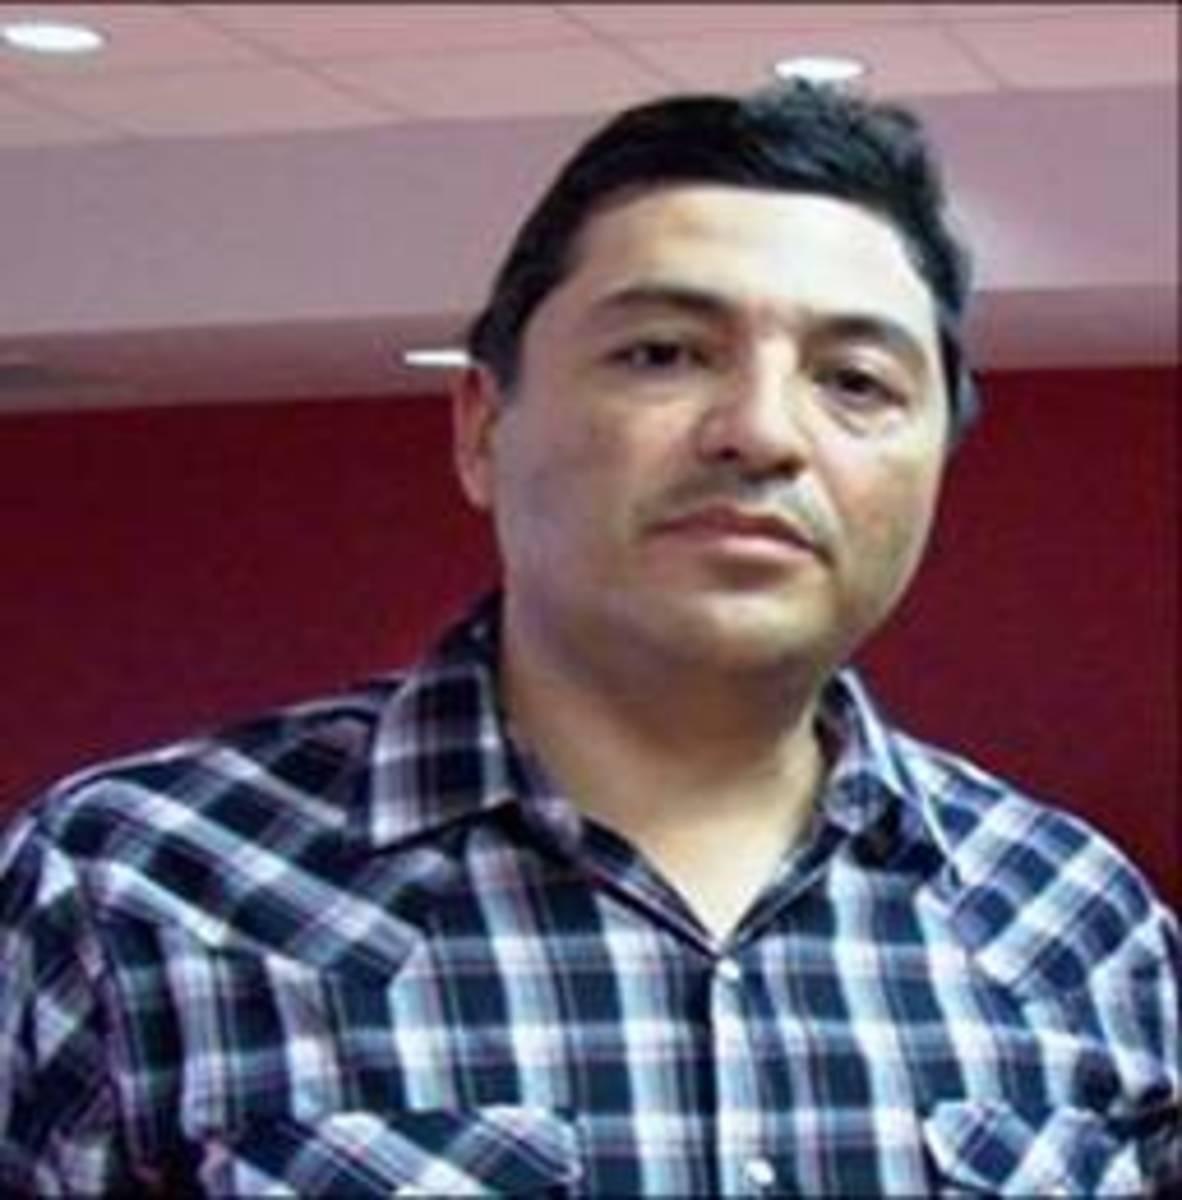 Mr. Chavez